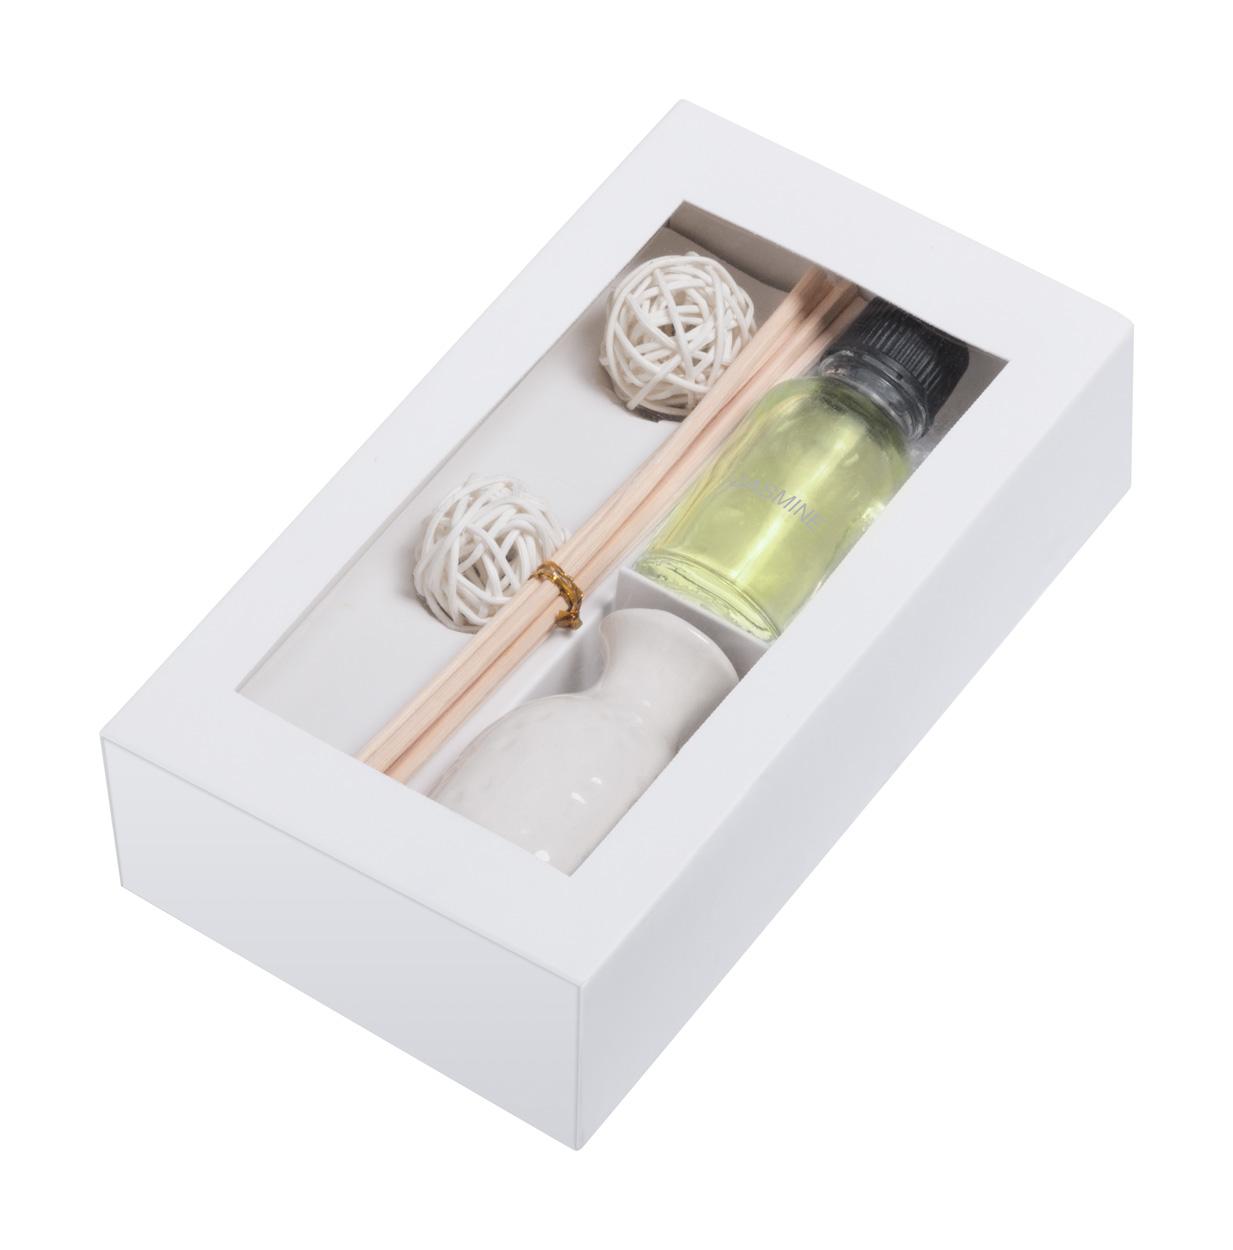 Nailex set diffuseur parfum